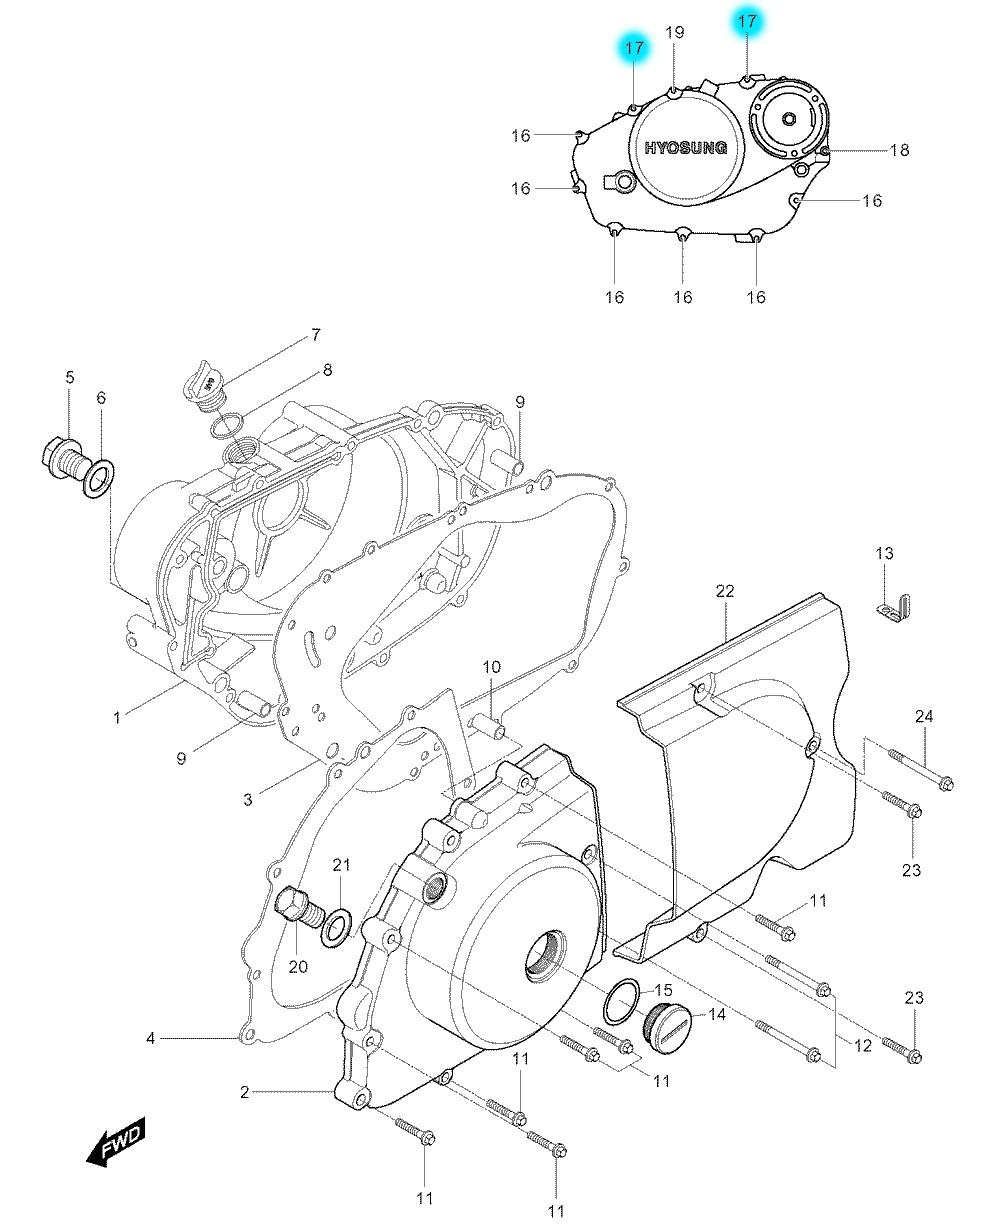 [17] Šroub (motor - kryty skříně) - Hyosung GV 250